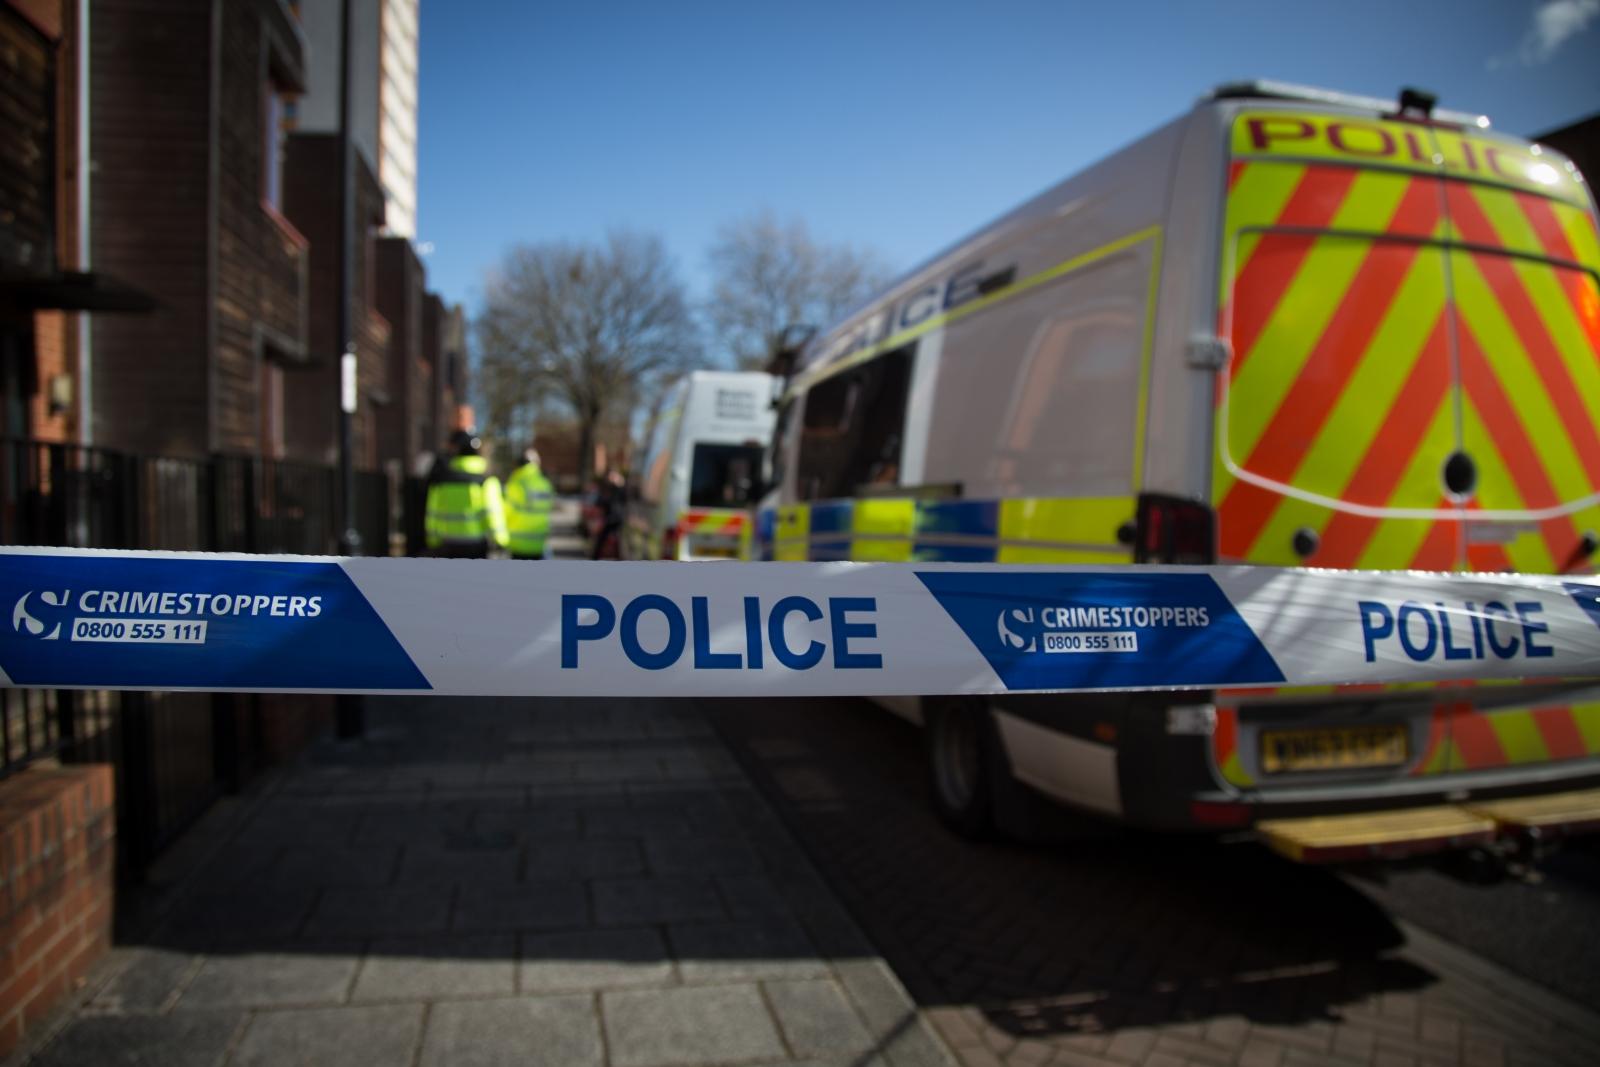 Hundreds of sex offenders missing in UK